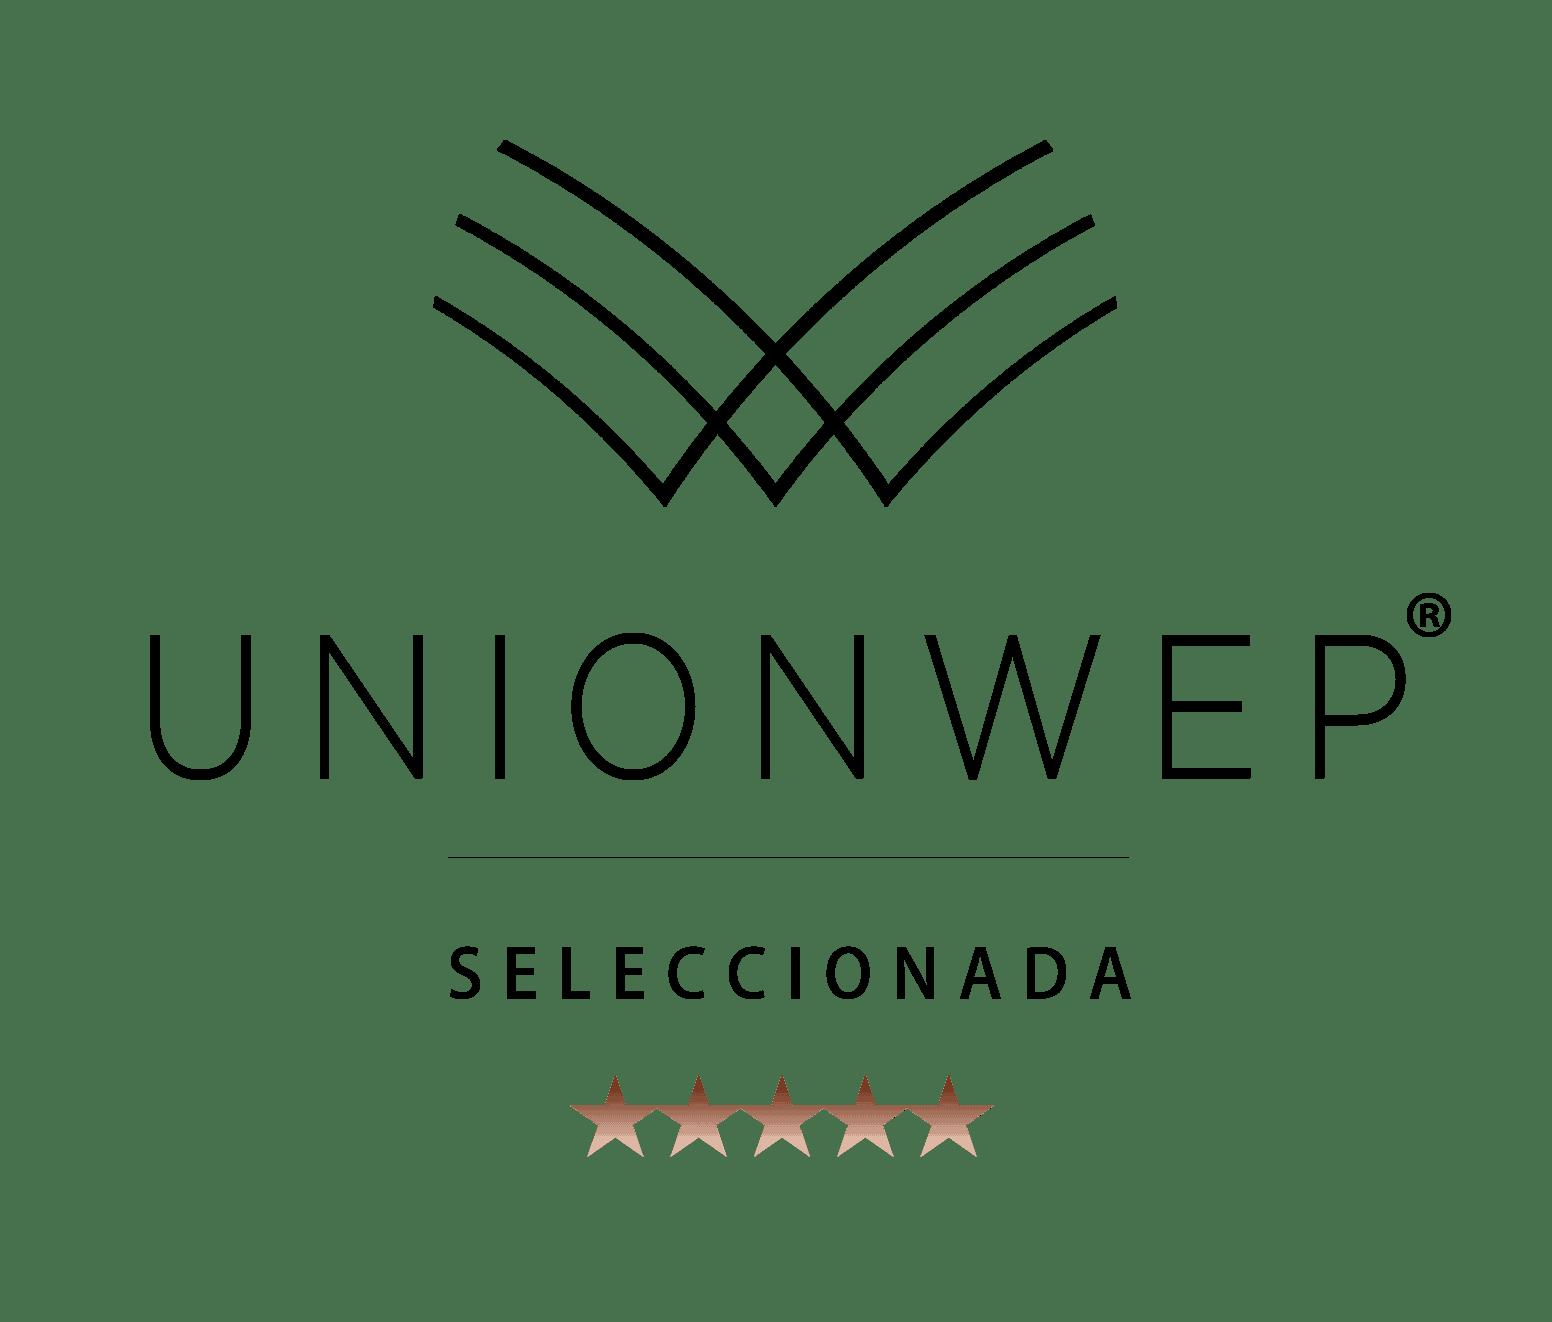 Unionwep Seleccionada Negro